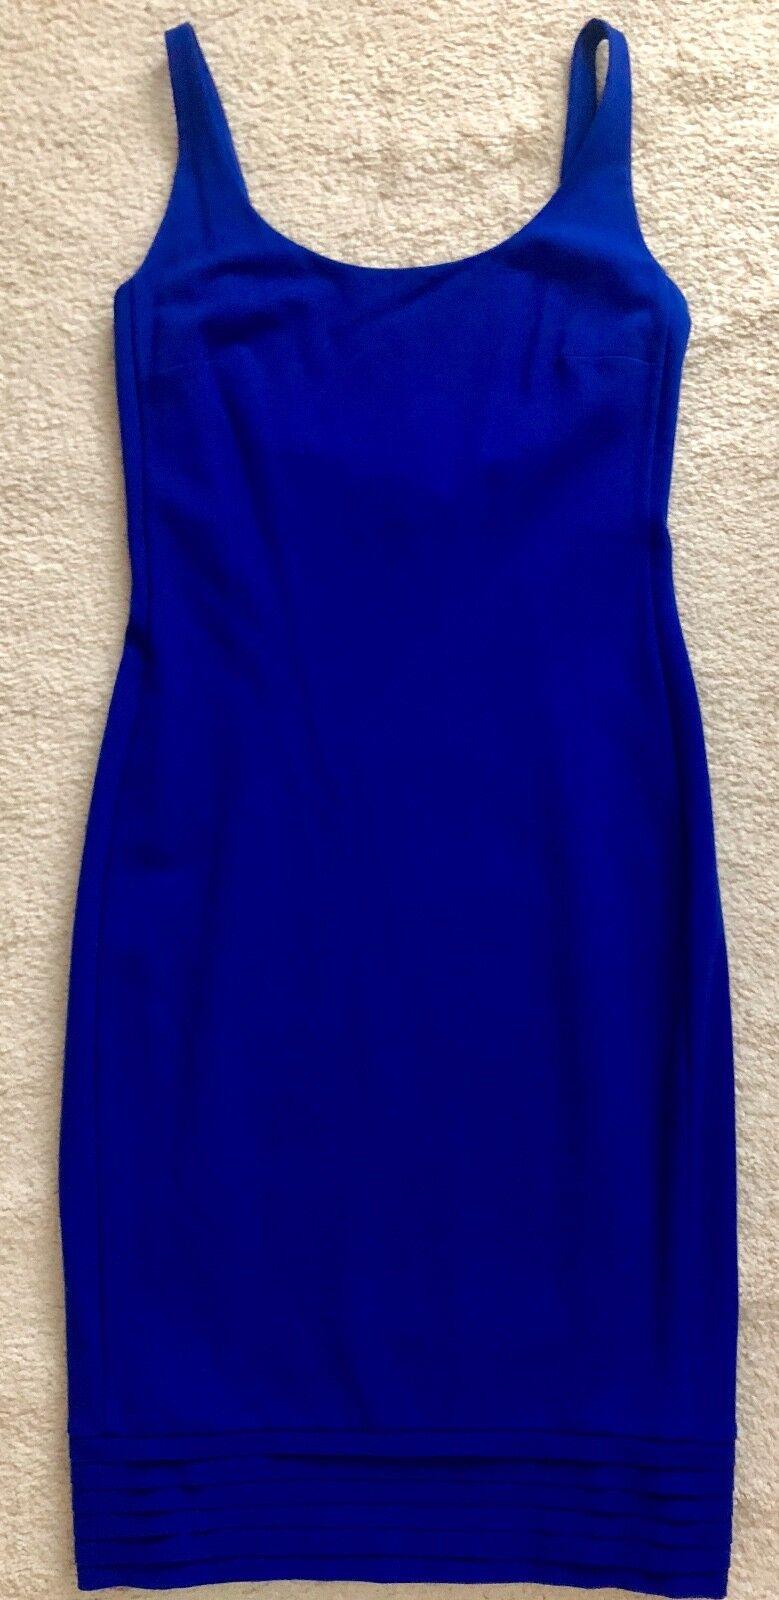 DVF Diane von Furstenberg Clean Bridget Bridget Bridget Dress Atlantic bluee Dress sz 10 & 8 NWT c0a21d